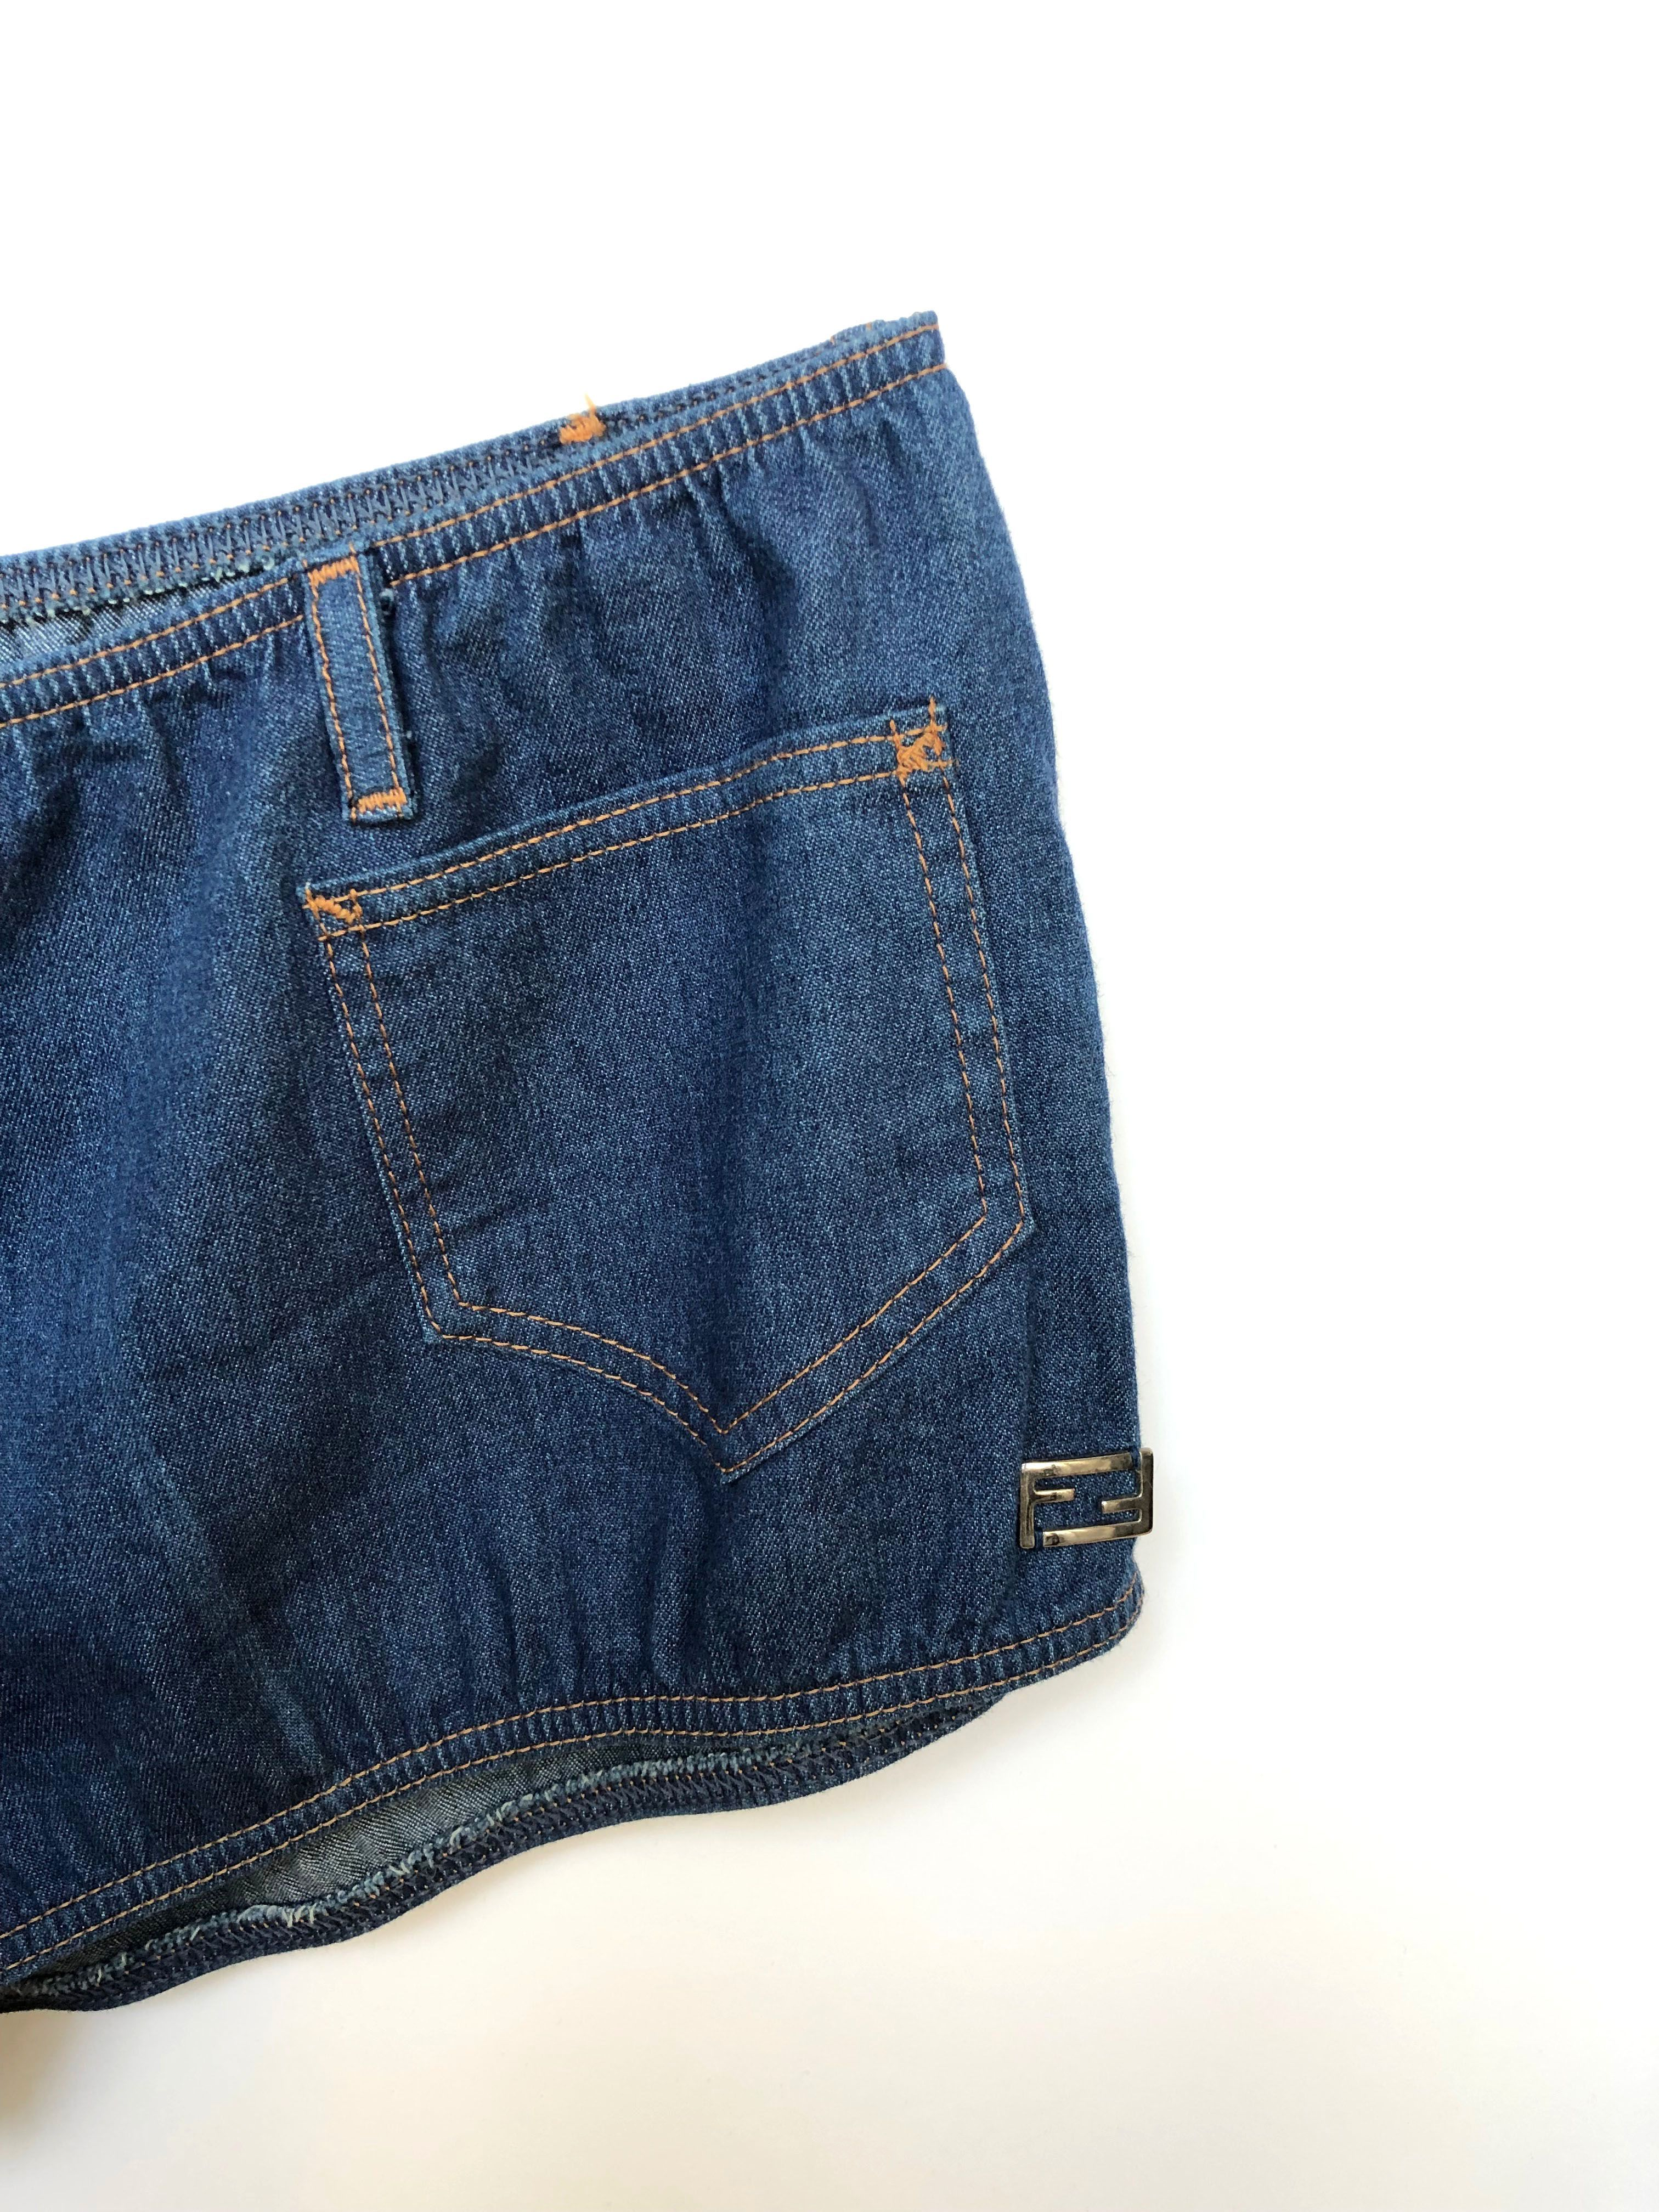 Shorts - Bikini Fendi